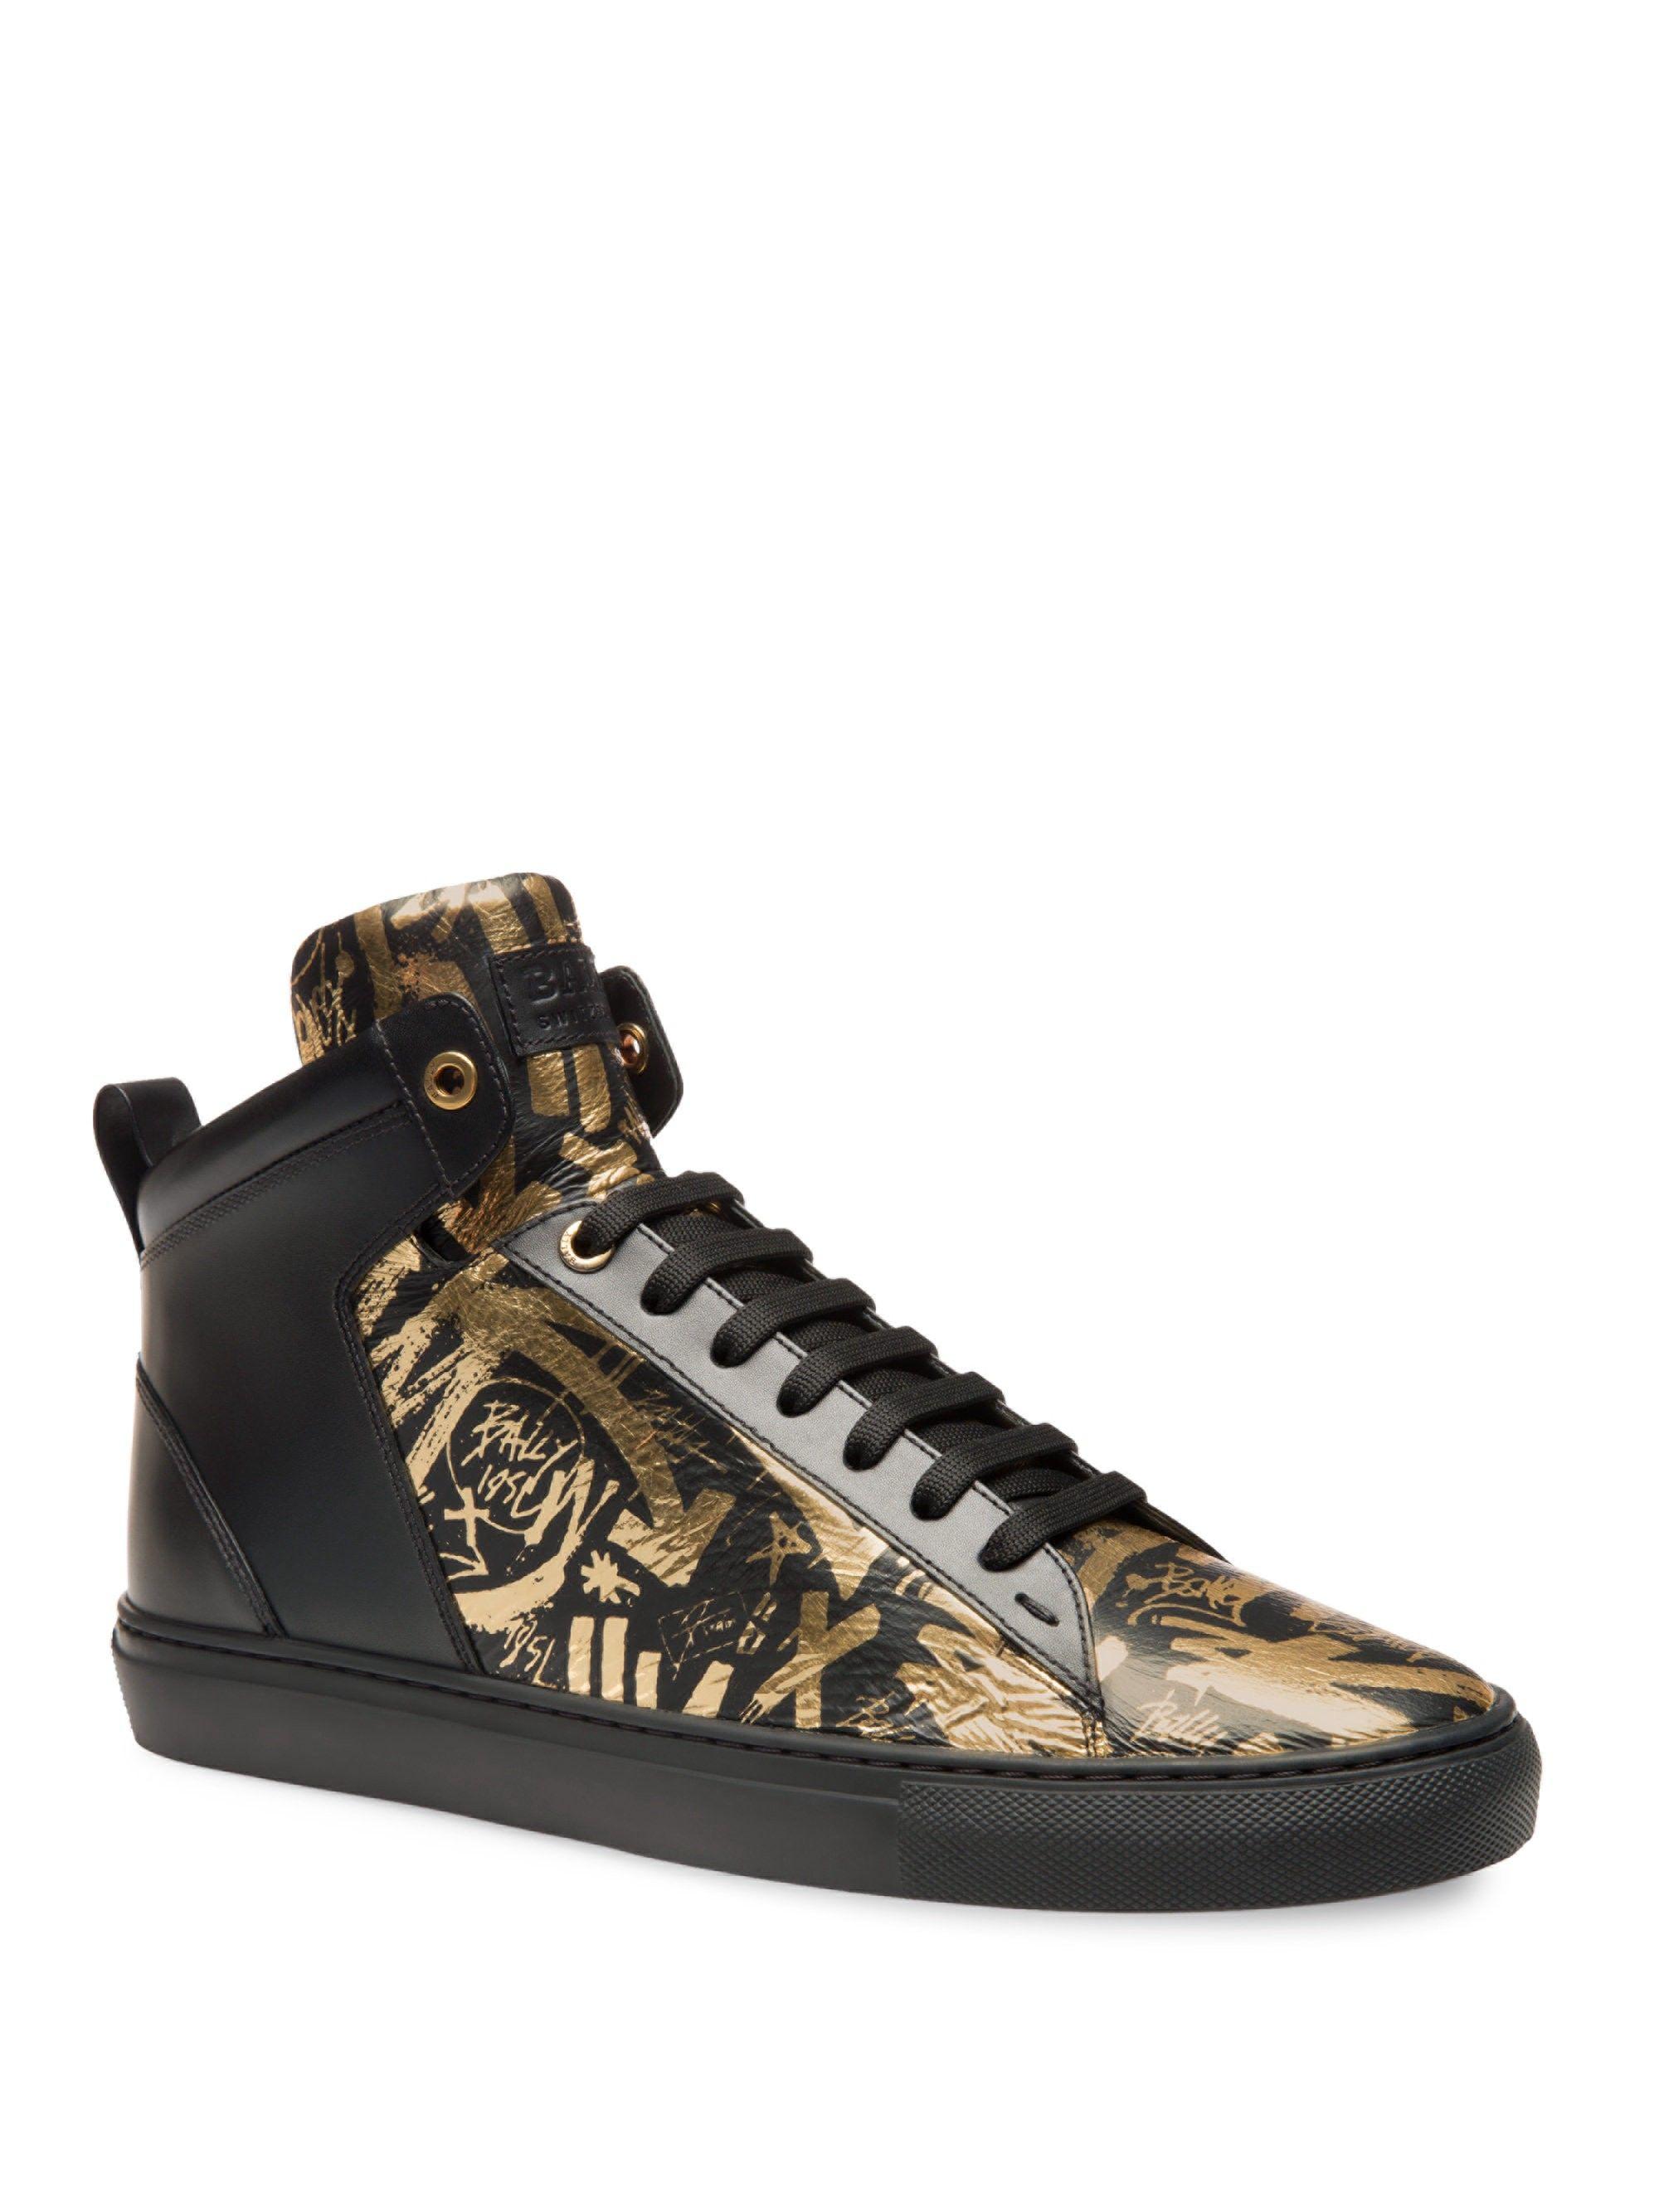 Bally Hedo Graffiti High-Top Sneakers